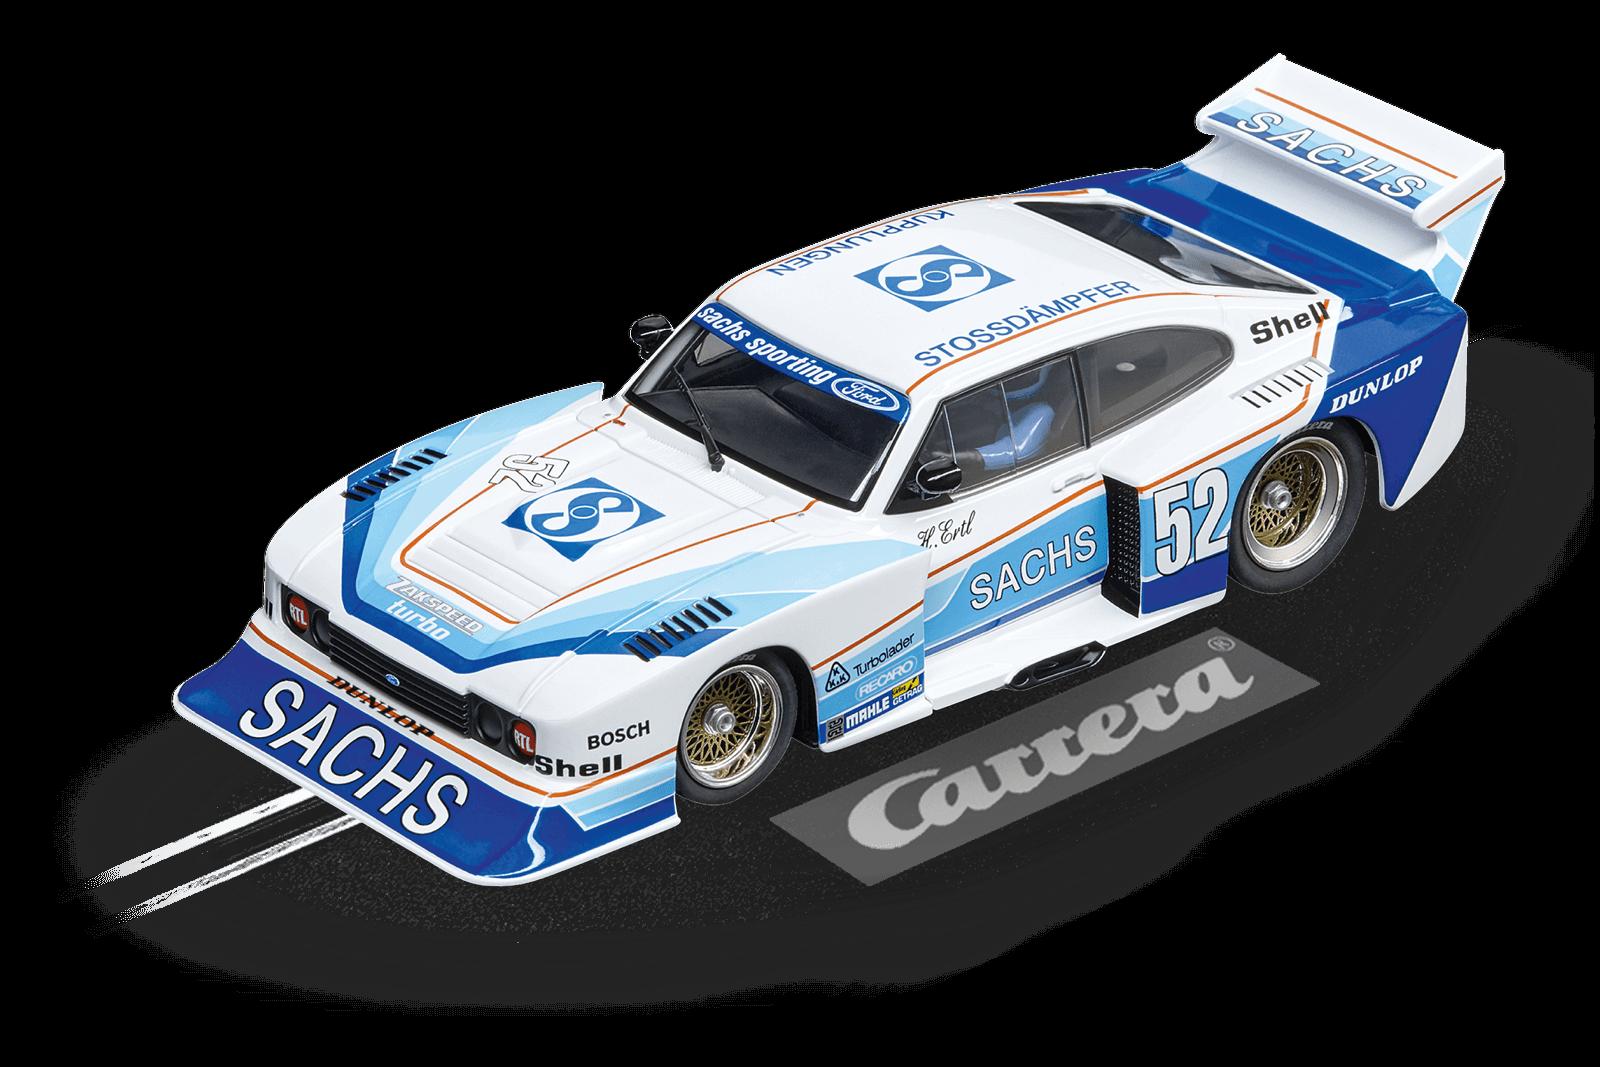 TOP Tuning   Carrera Digital 132  -  Ford Capri Turbo   Sachs, No.52   30831